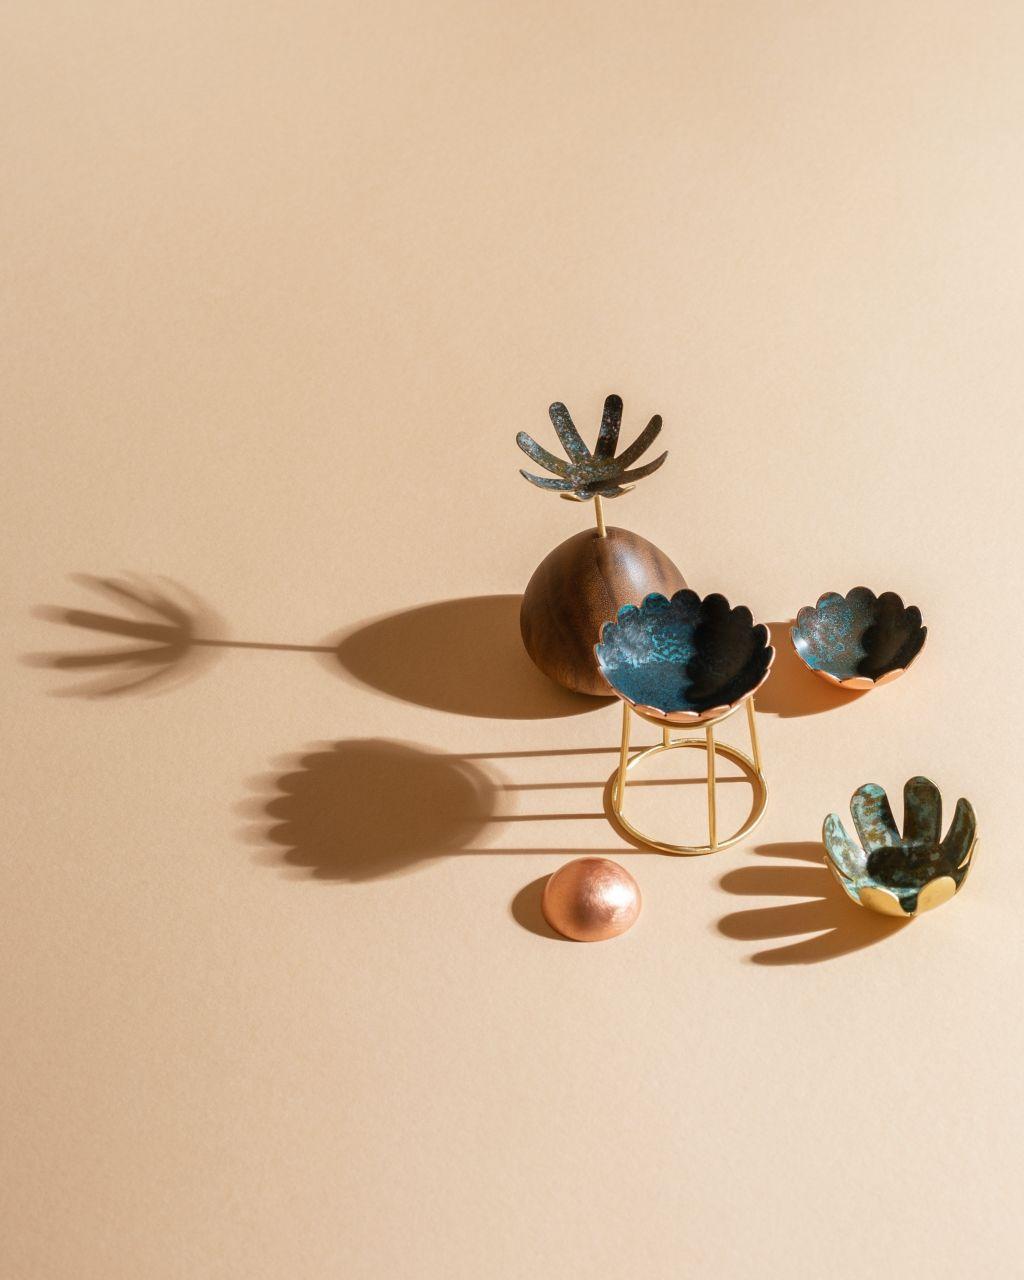 Zen garden of objects for your scattered souls. Photo: @tereza.valner alias @date.collective #vnkvstudio #vnkv #janavonkova #snoveprostory #maleobjekty #ceskydesign #dreamspaces #littleobjects #artdesign #interioraccesories #littlesculptures #handmade #slowdesign #uniquepieces #originalpieces #czechdesign #etsy #setdesign #lagom #unique #tyhashtagymezabijou